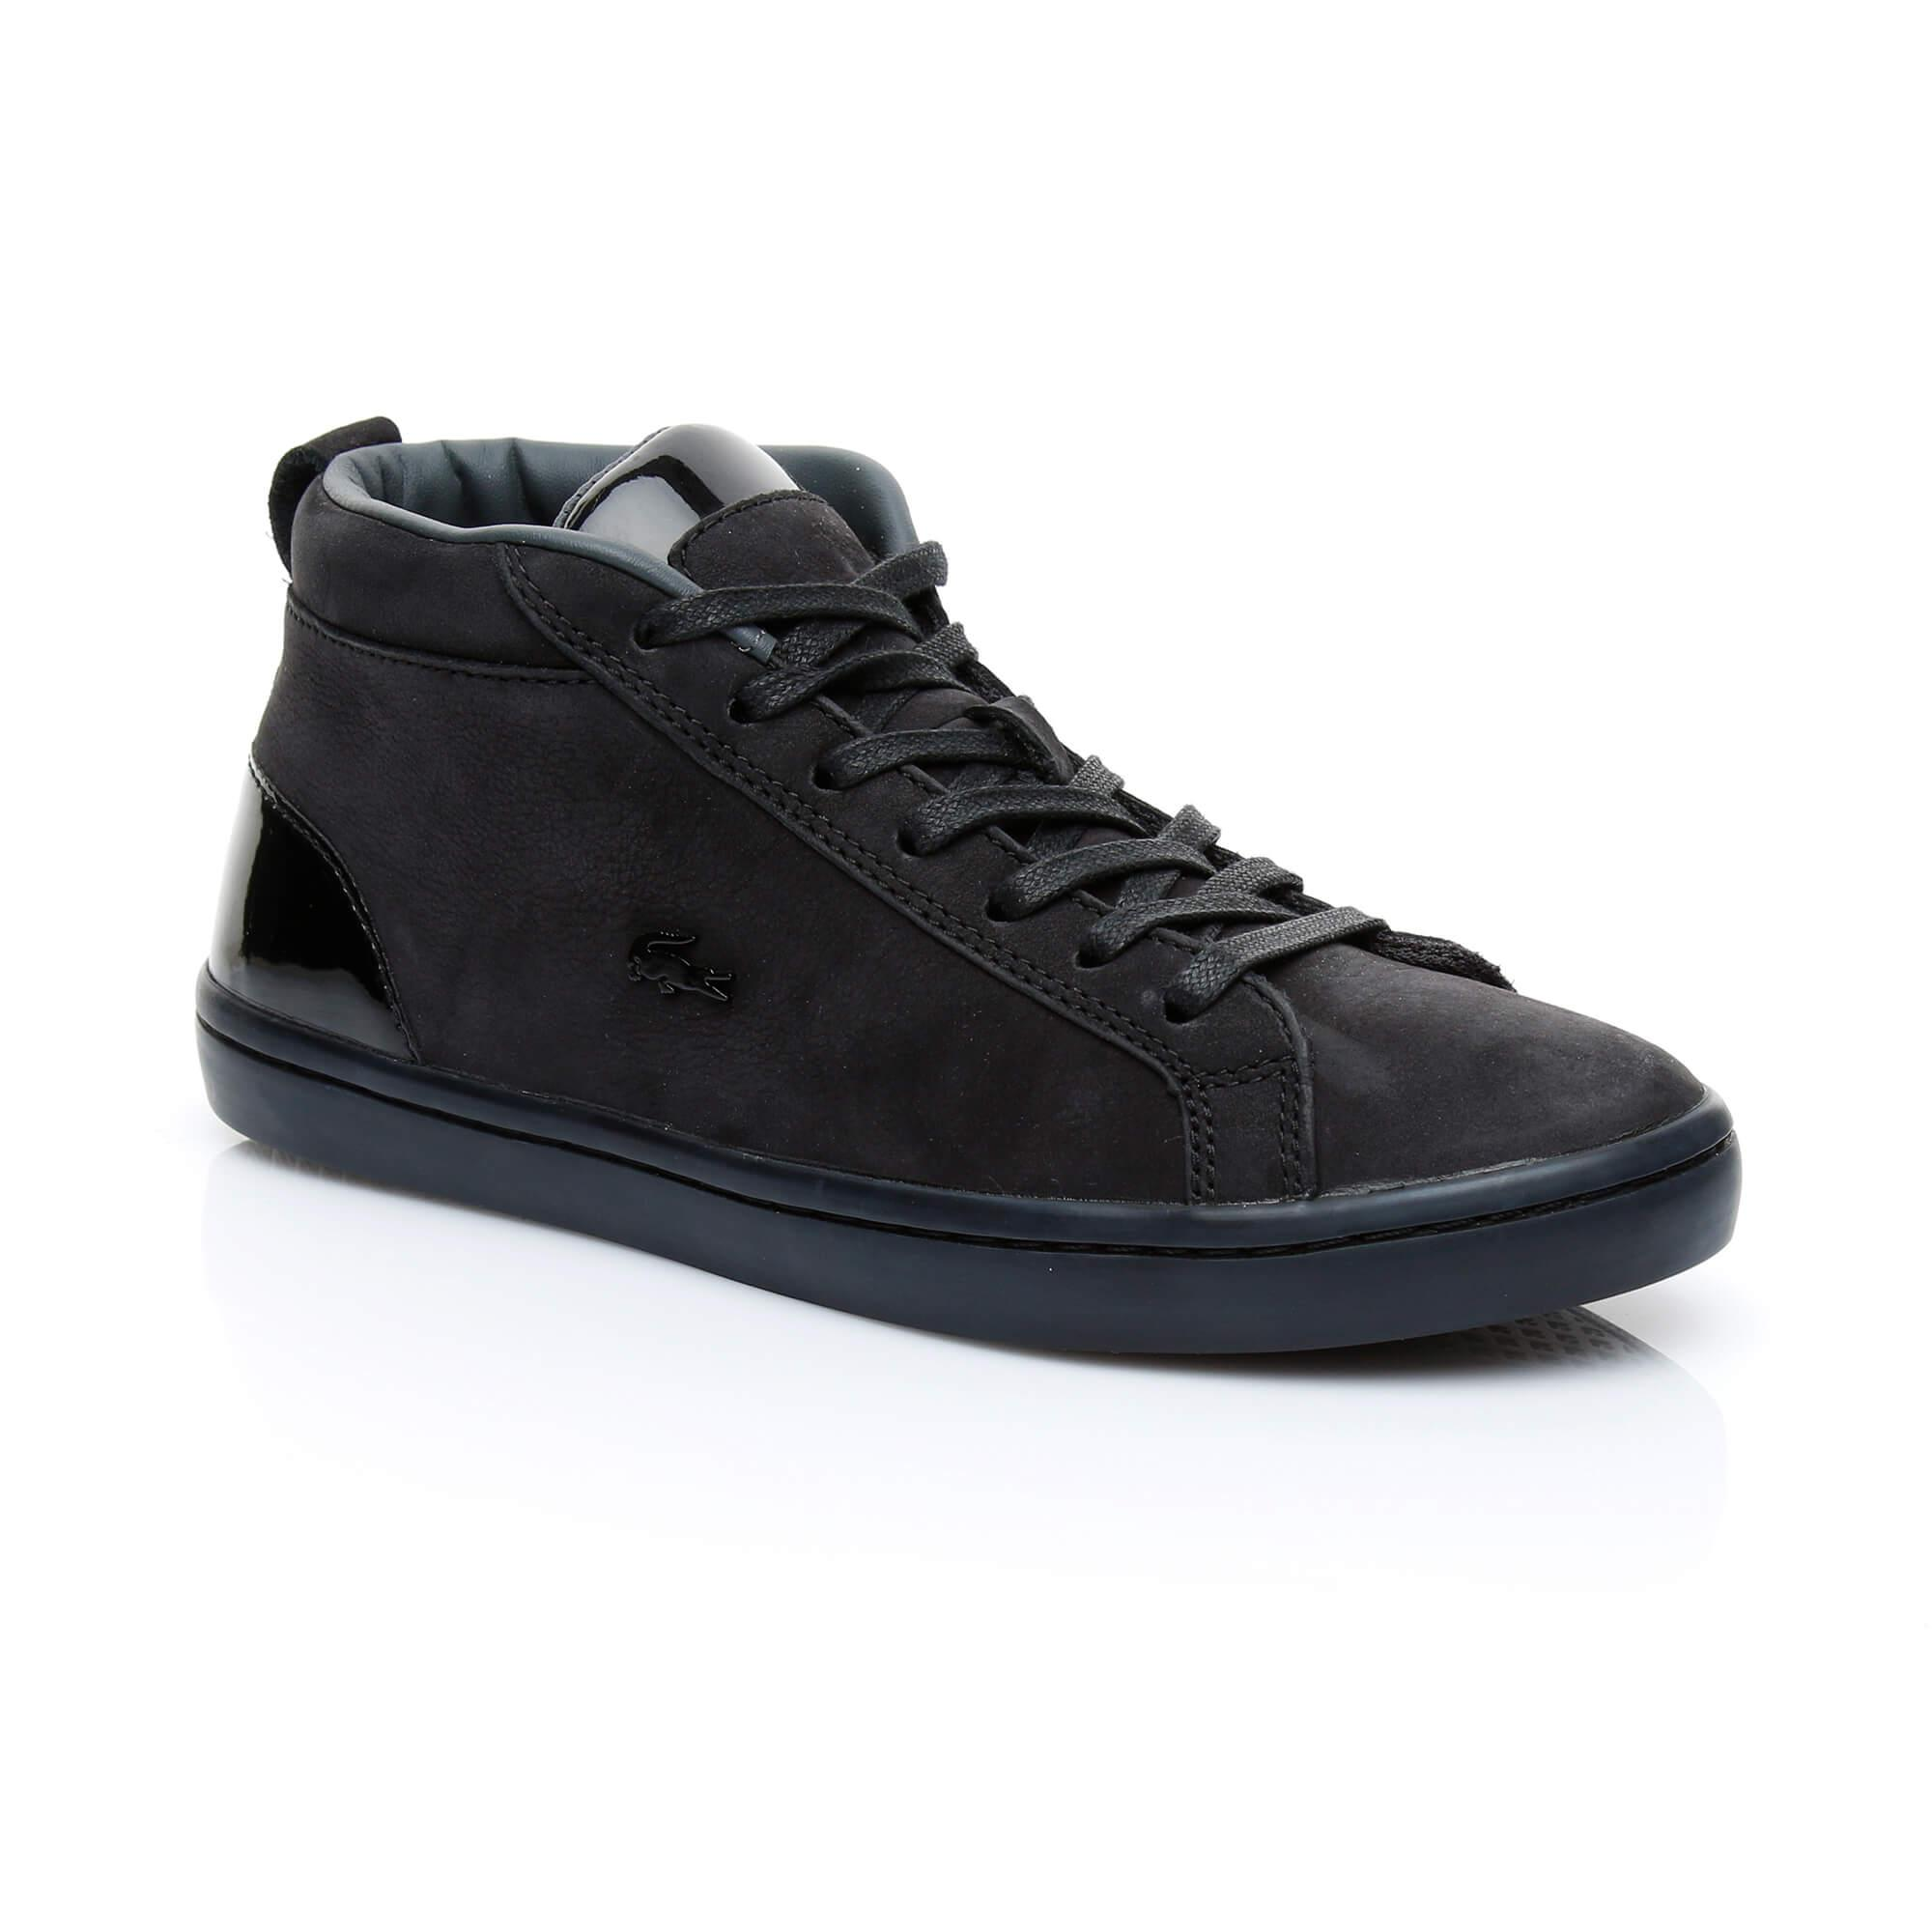 Lacoste Kadın Straightset C 318 1 Siyah Sneaker